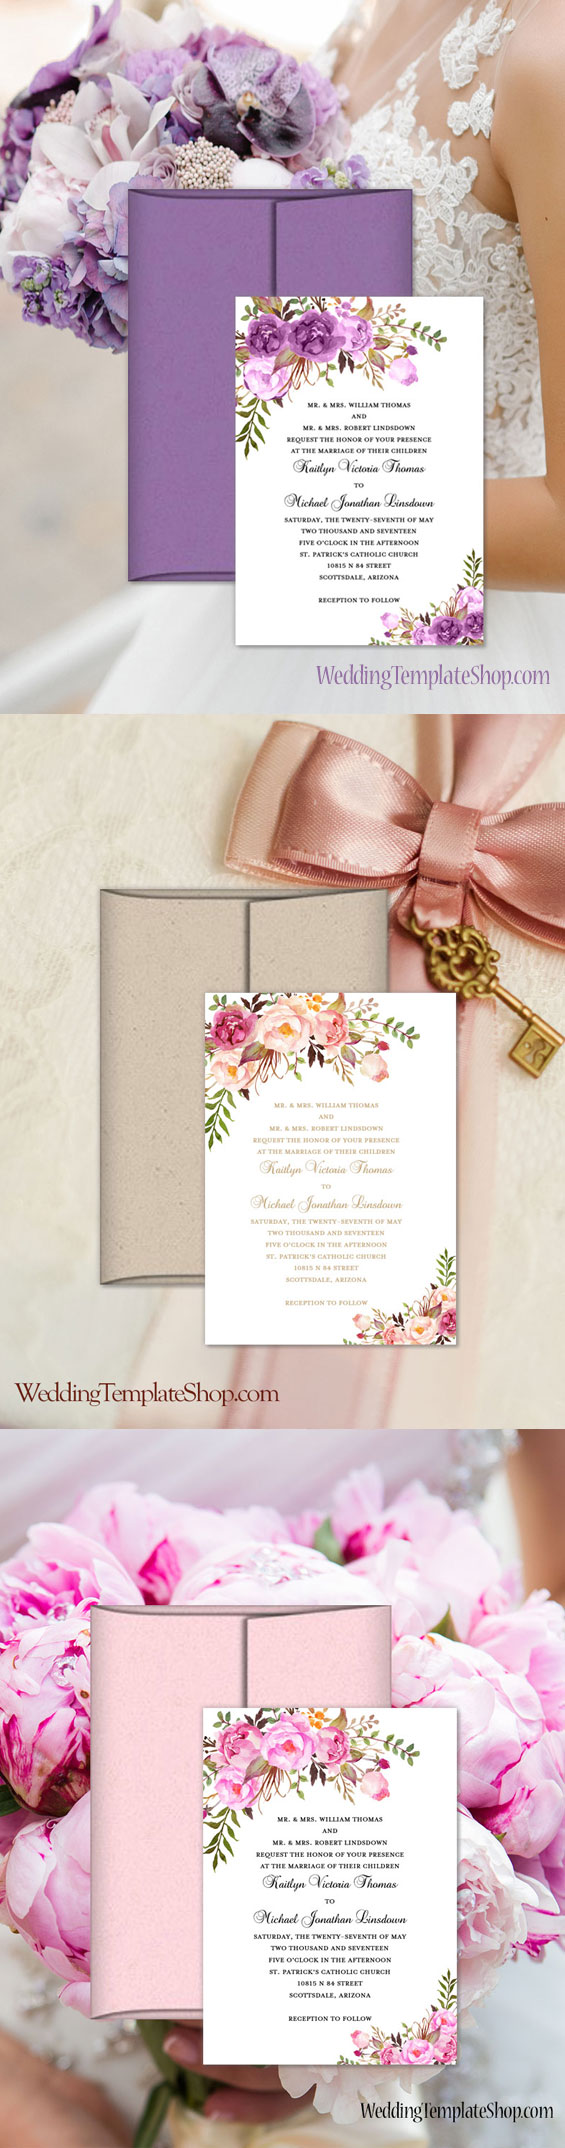 30 Awesome Wedding Invitation Wording Editing Graphics Wedding